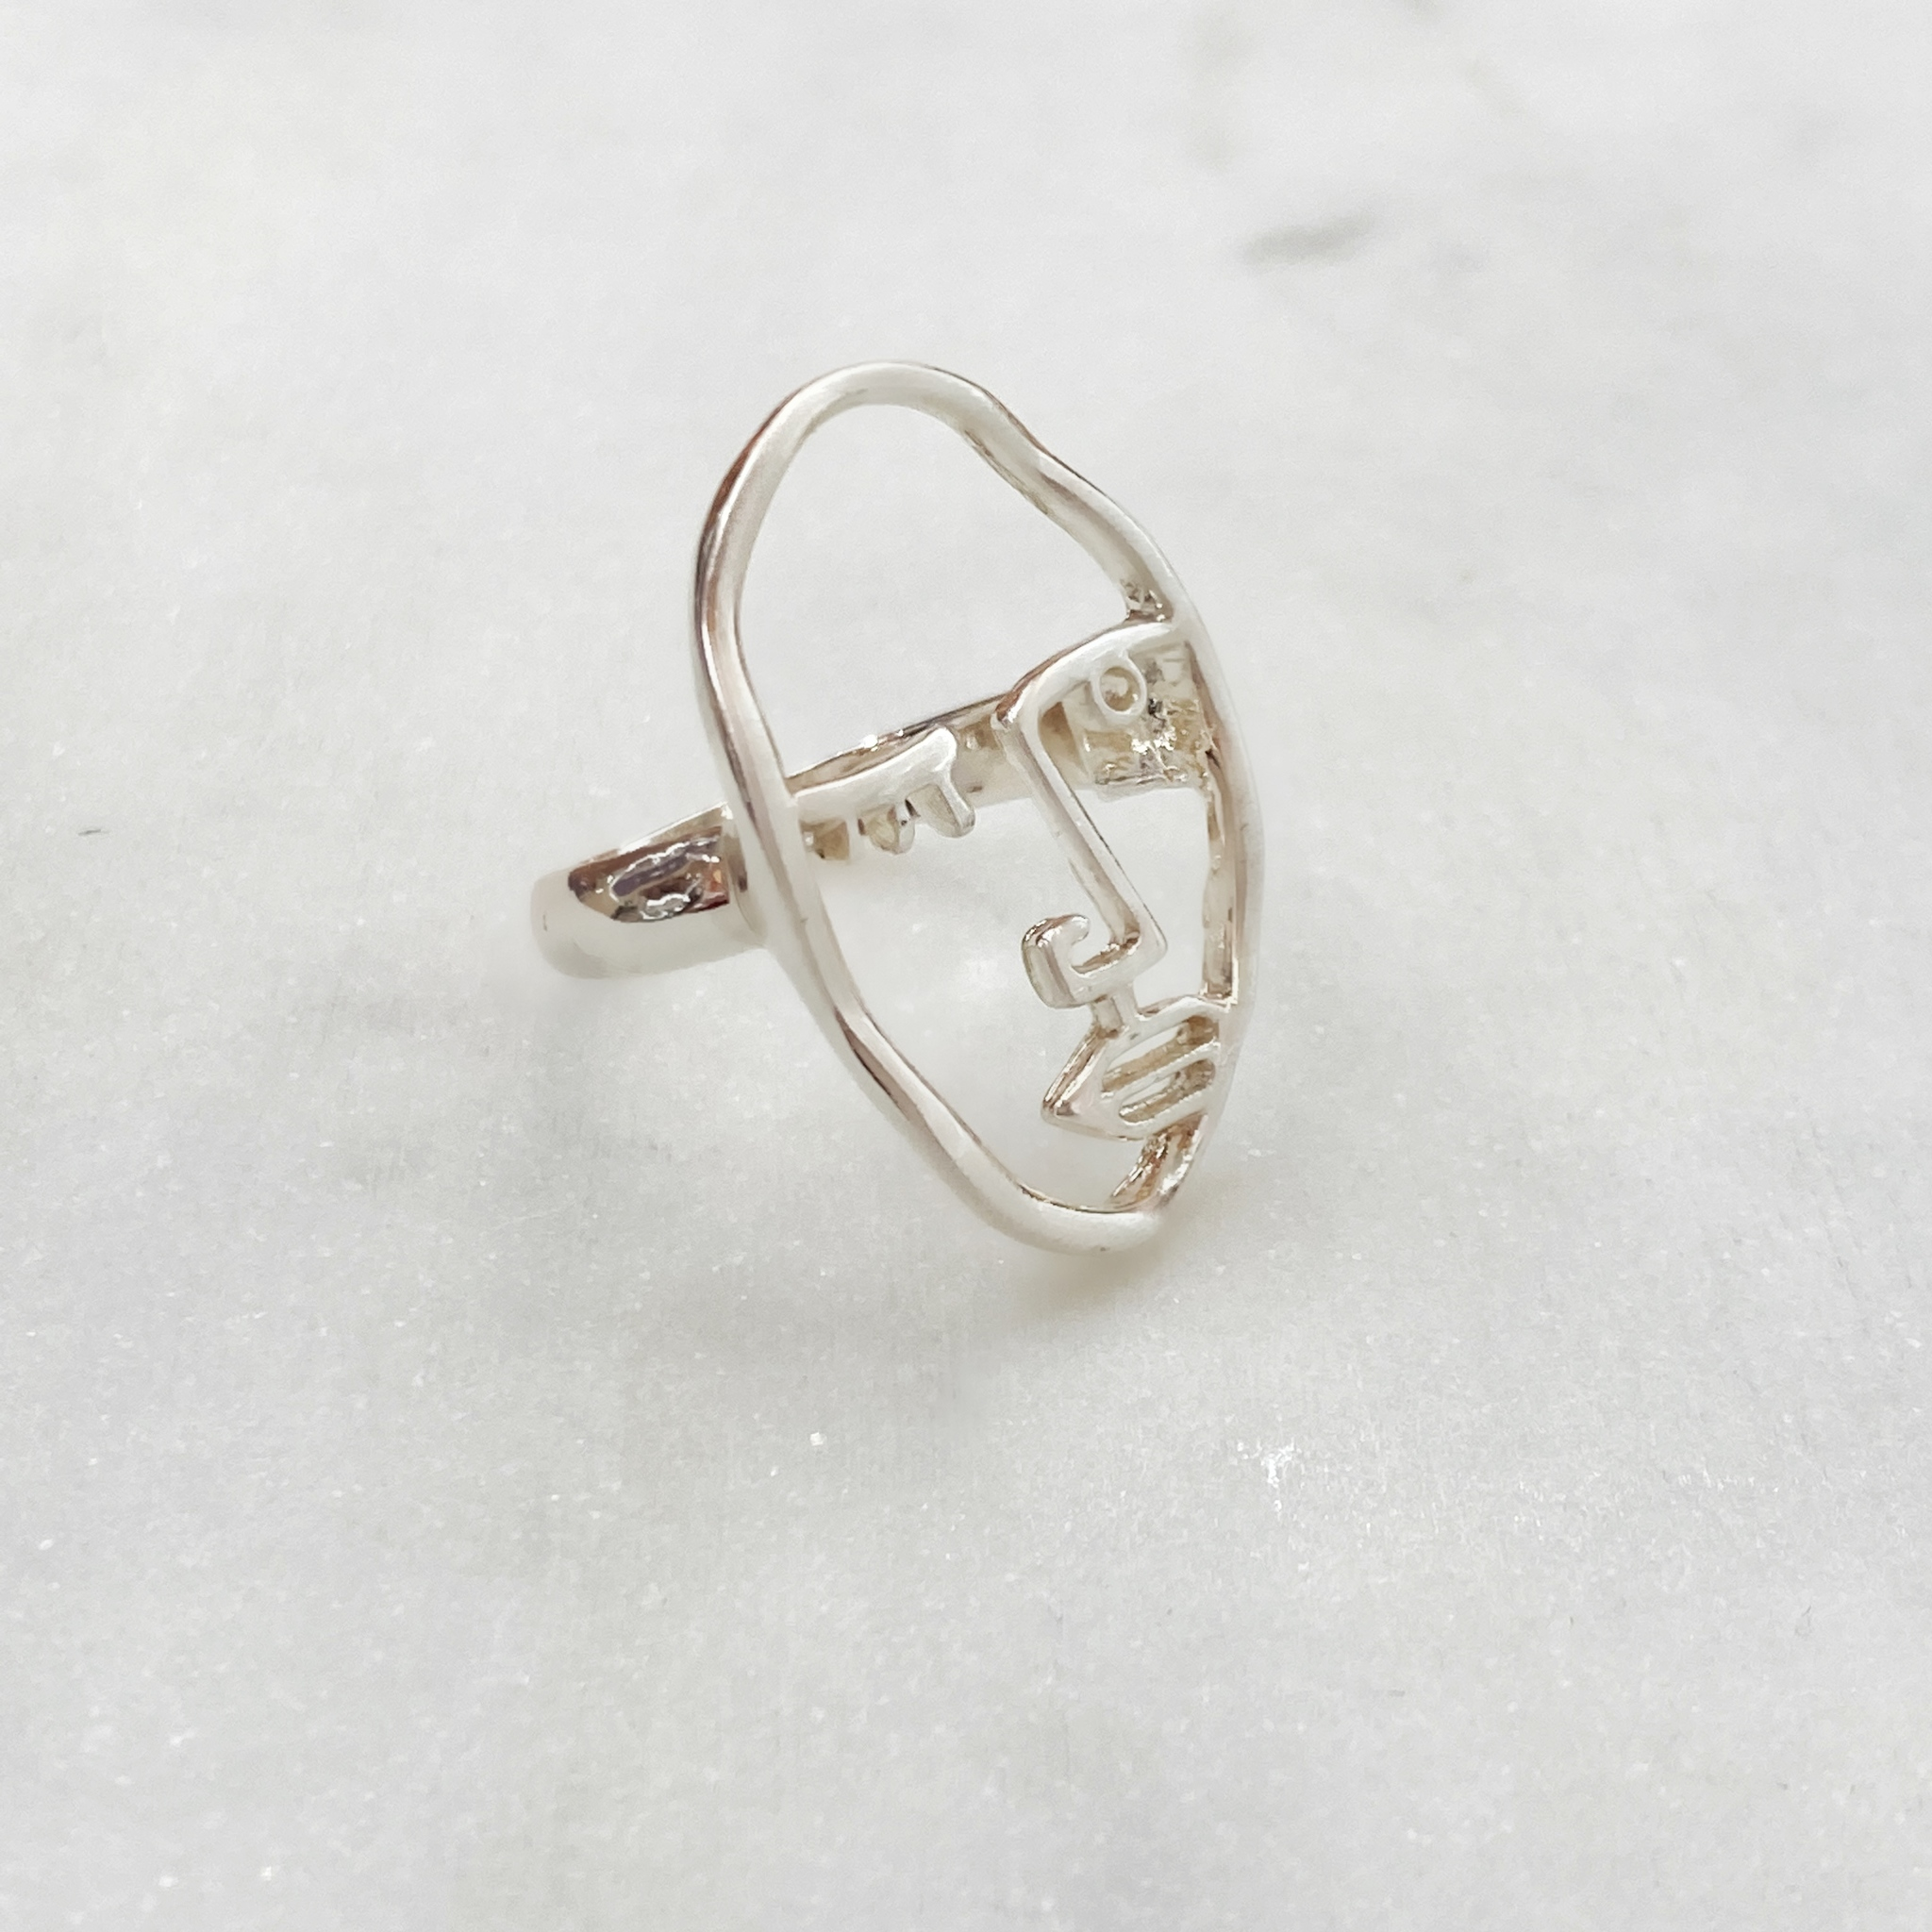 Кольцо Vi Лицо Контур муж серебряный